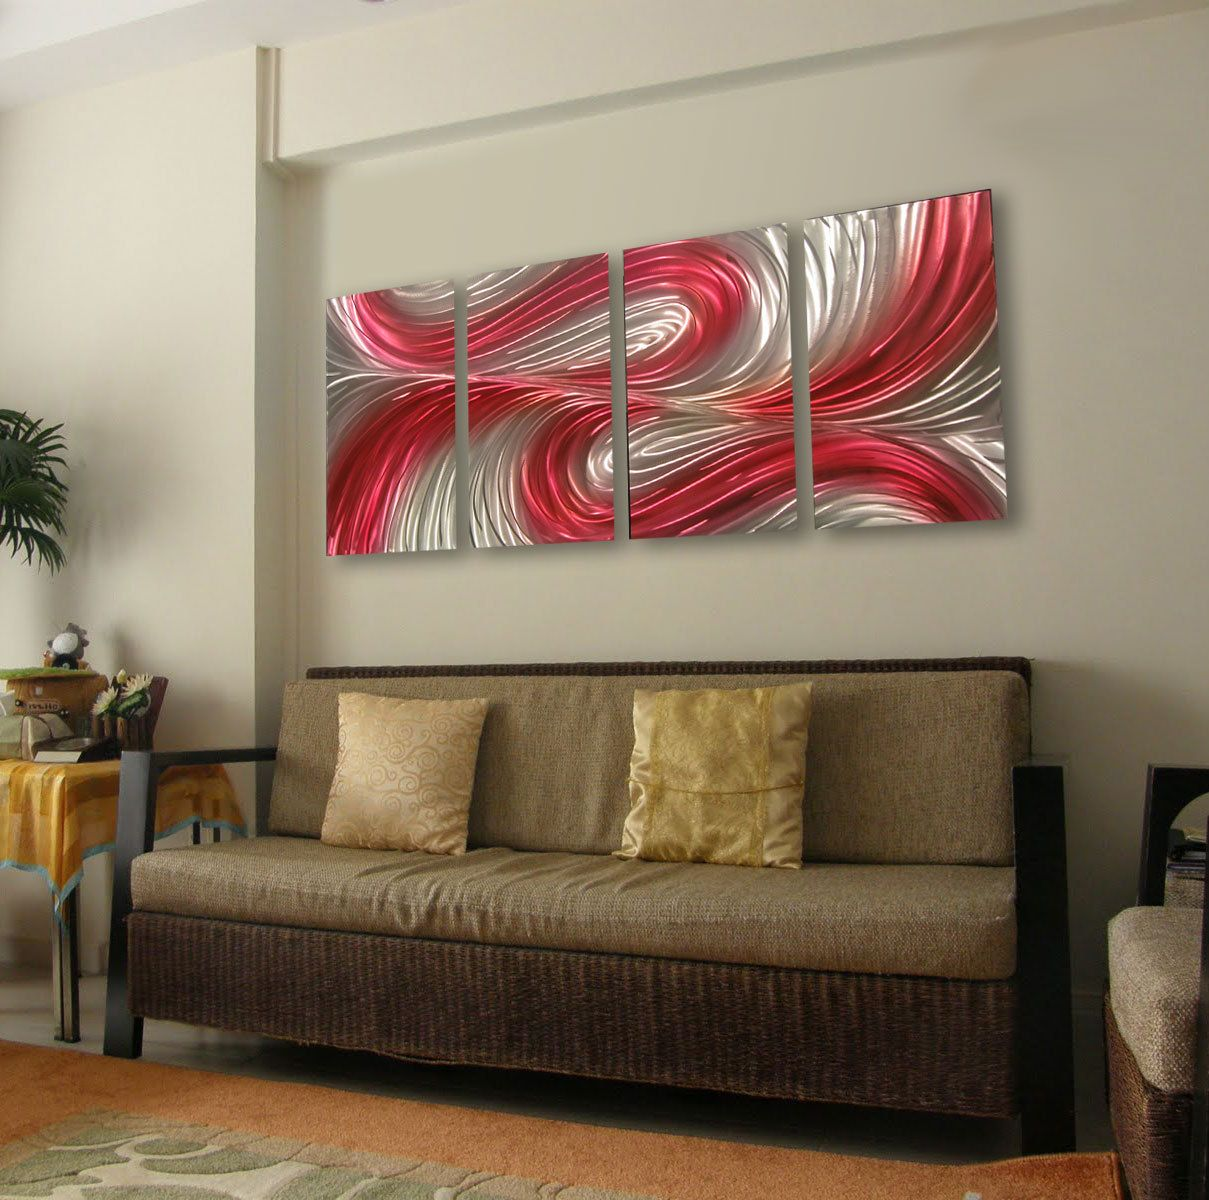 Metal wall art decor abstract contemporary modern sculpture hanging